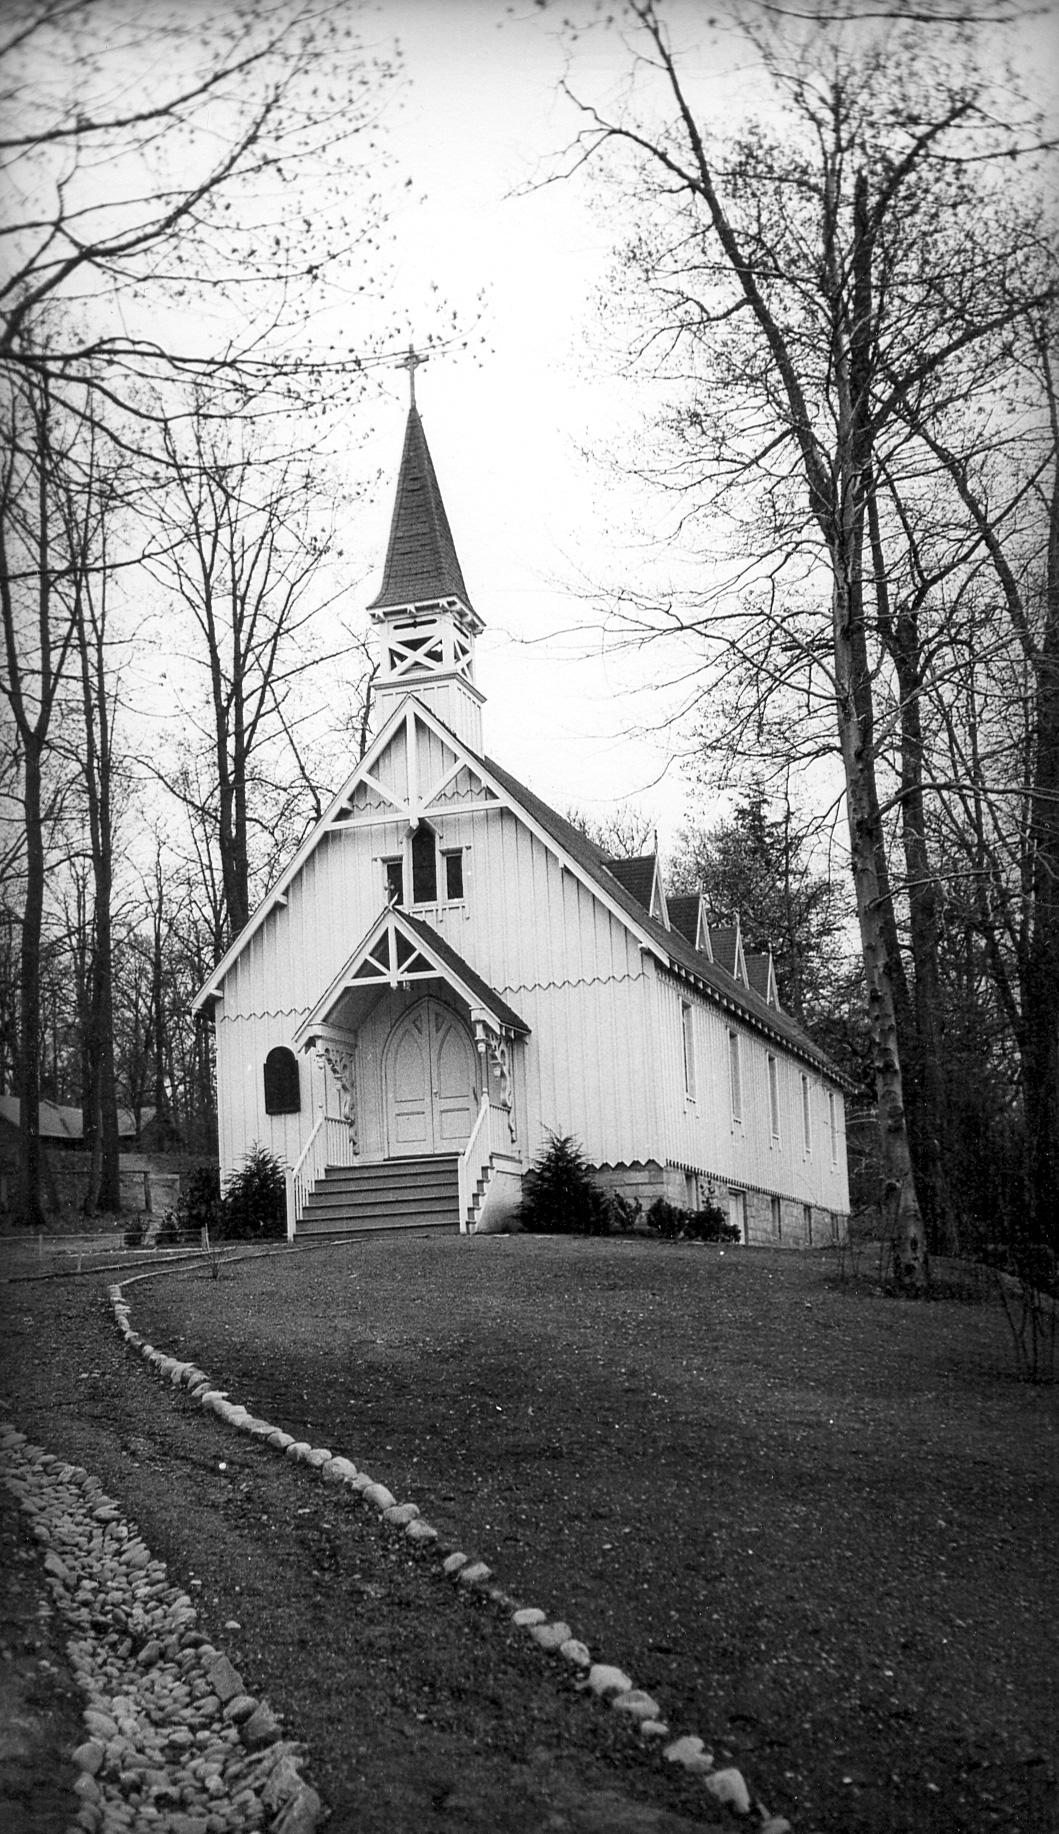 All photos courtesy of the Historical Society